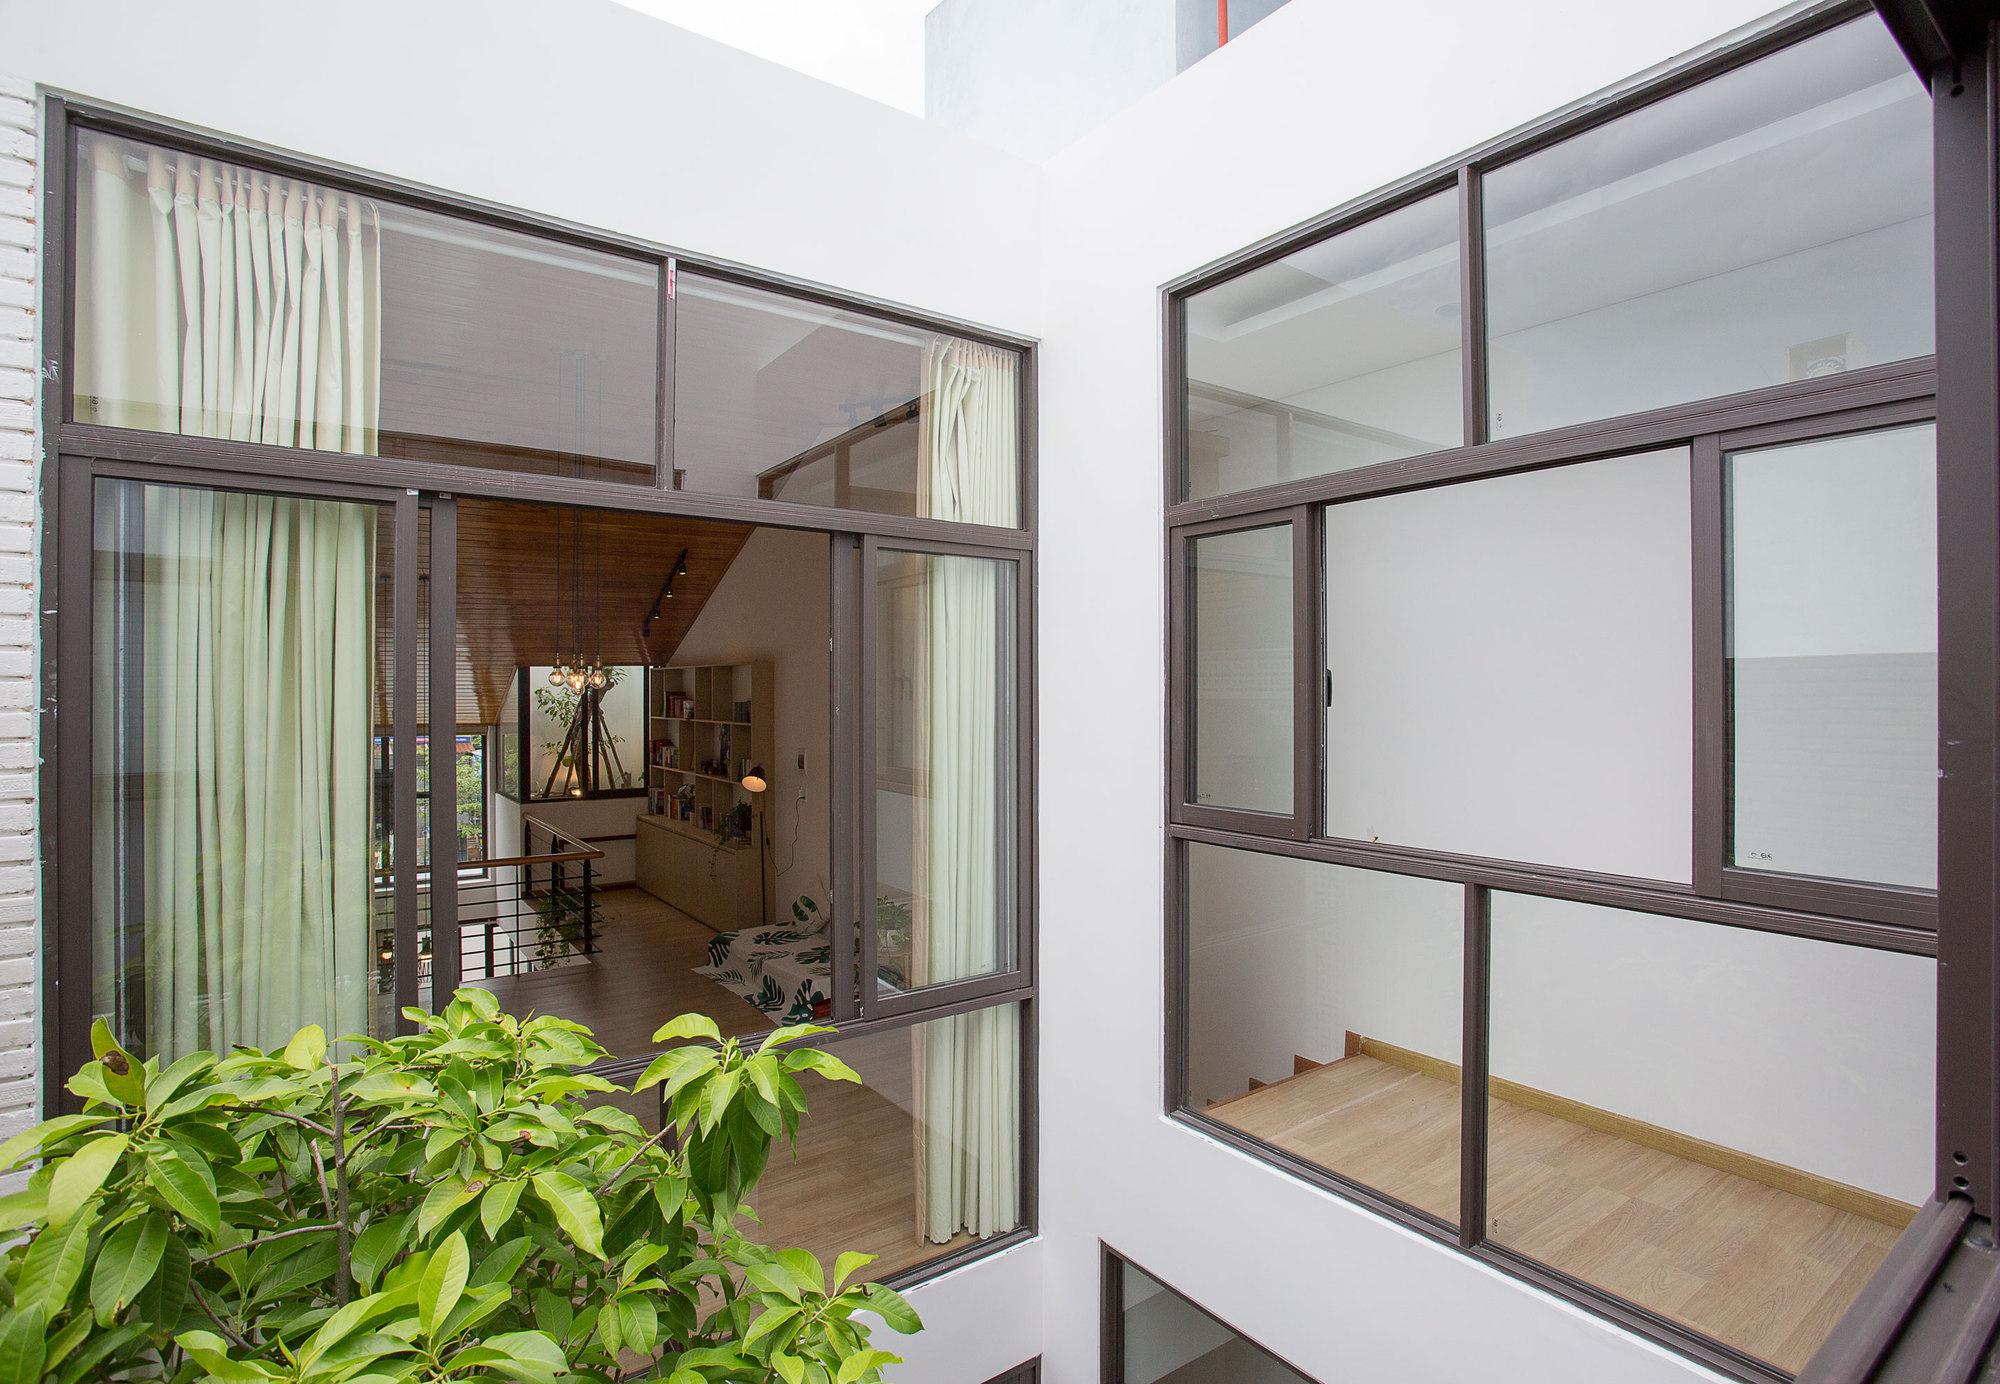 Minimalist House 85 Design - 4